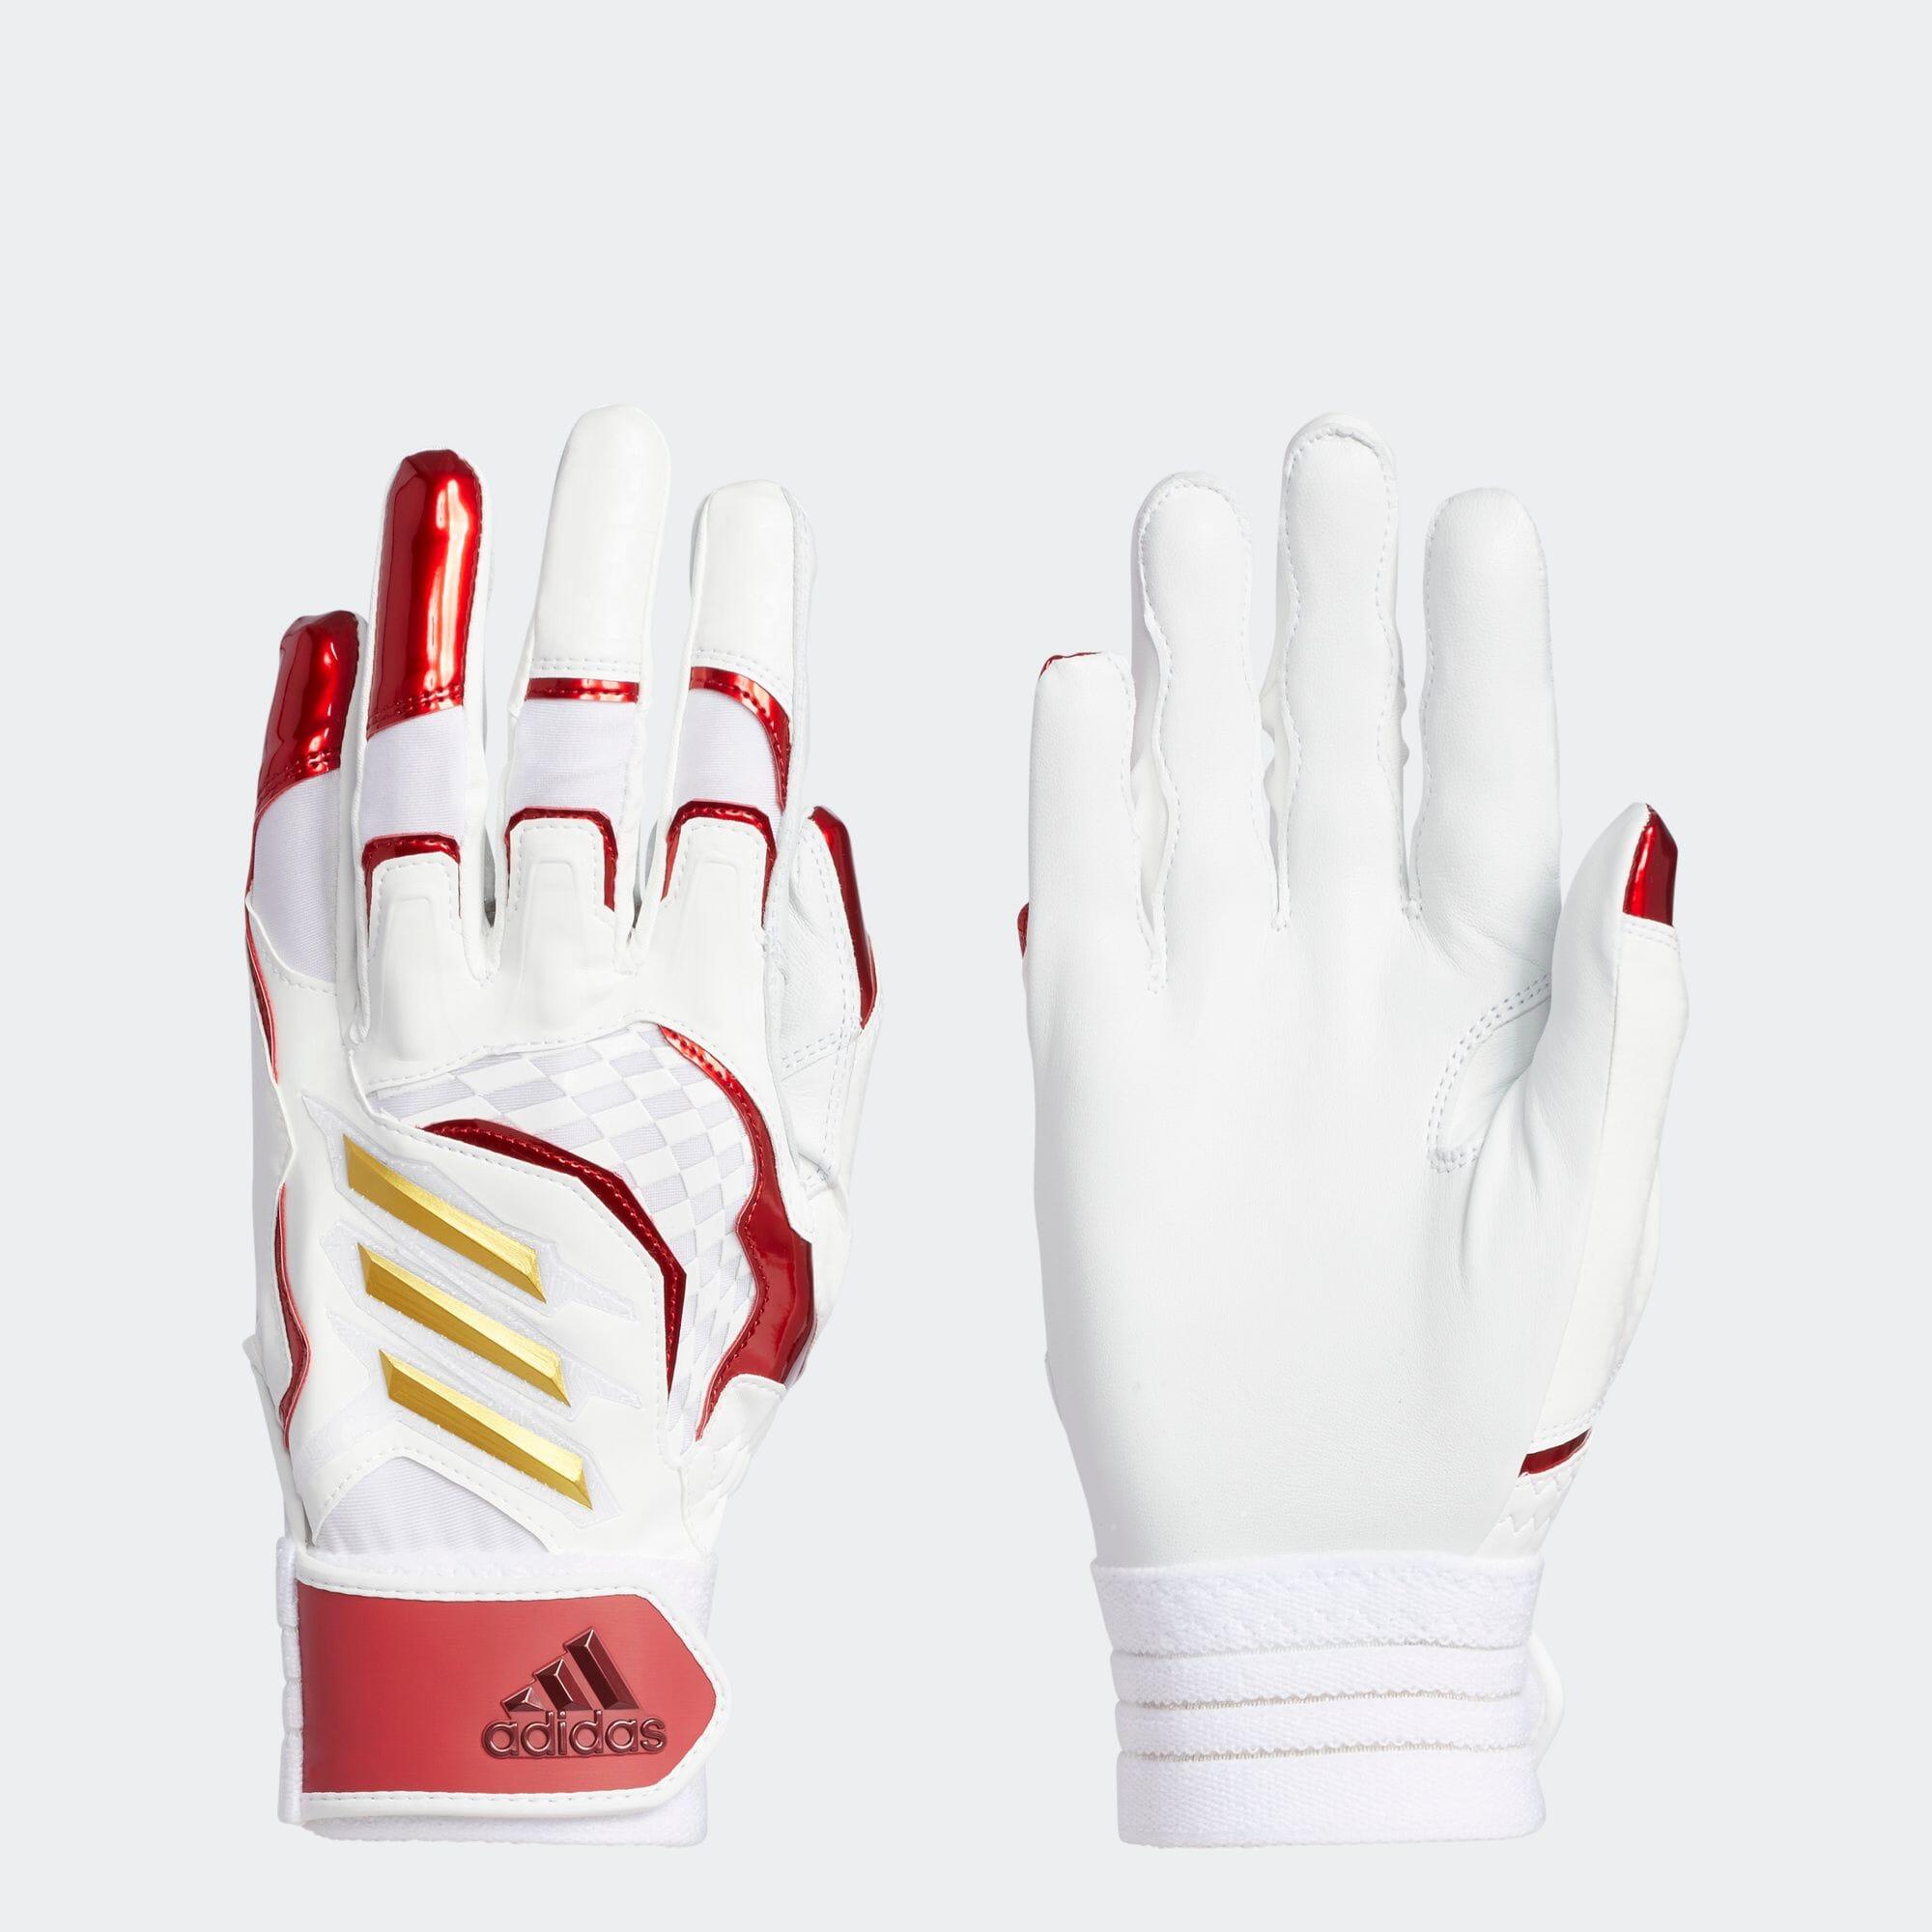 5T バッティング グローブ / 5 Tool Batting Gloves